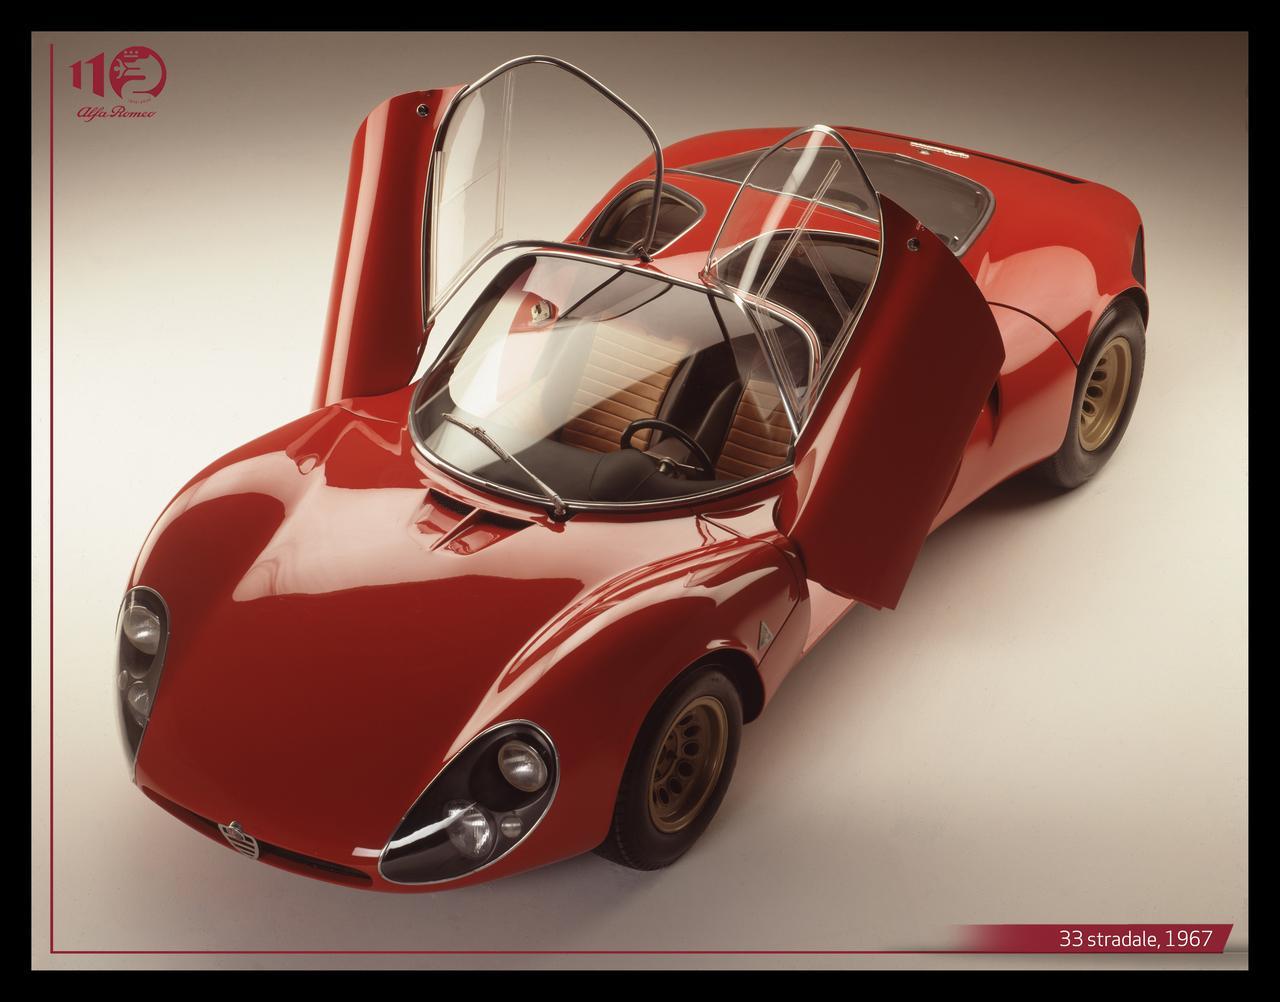 rsz_33-stradale-1967_1.jpg